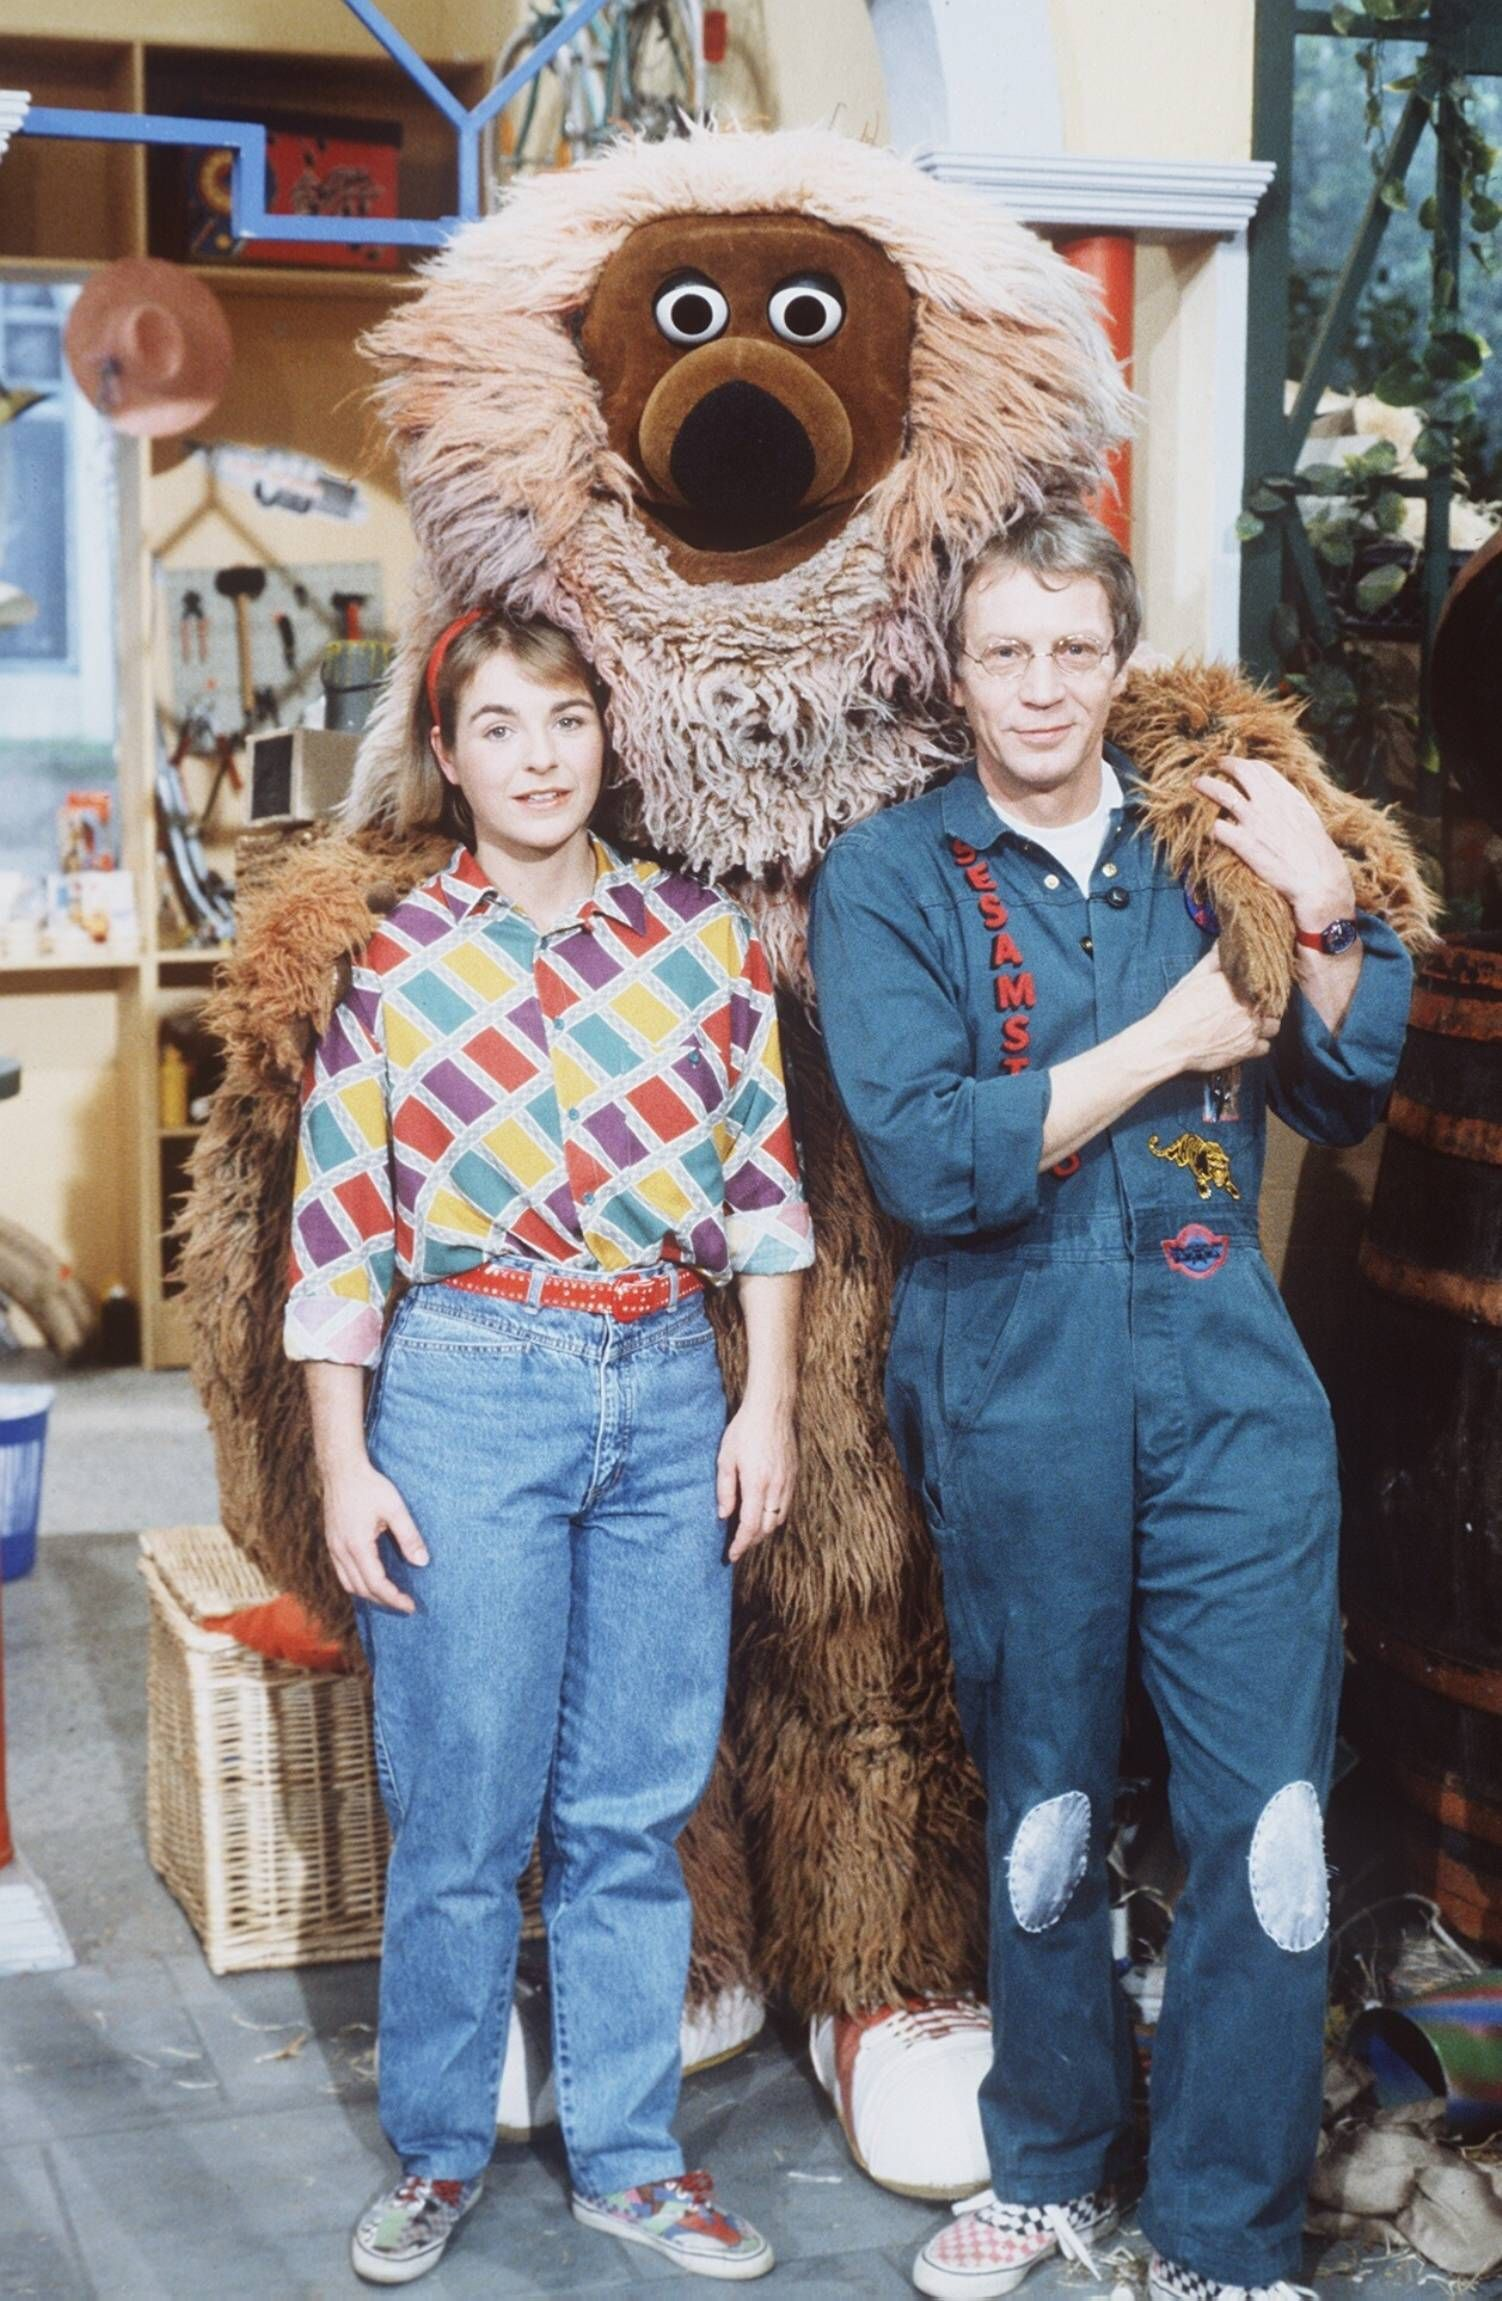 Sesamstraße (v. li.) K. Sprick, Samson, G. Endemann 11/91 dar Fernsehen Serie Puppe TV-Produktion Sesamstraße ARD Samso